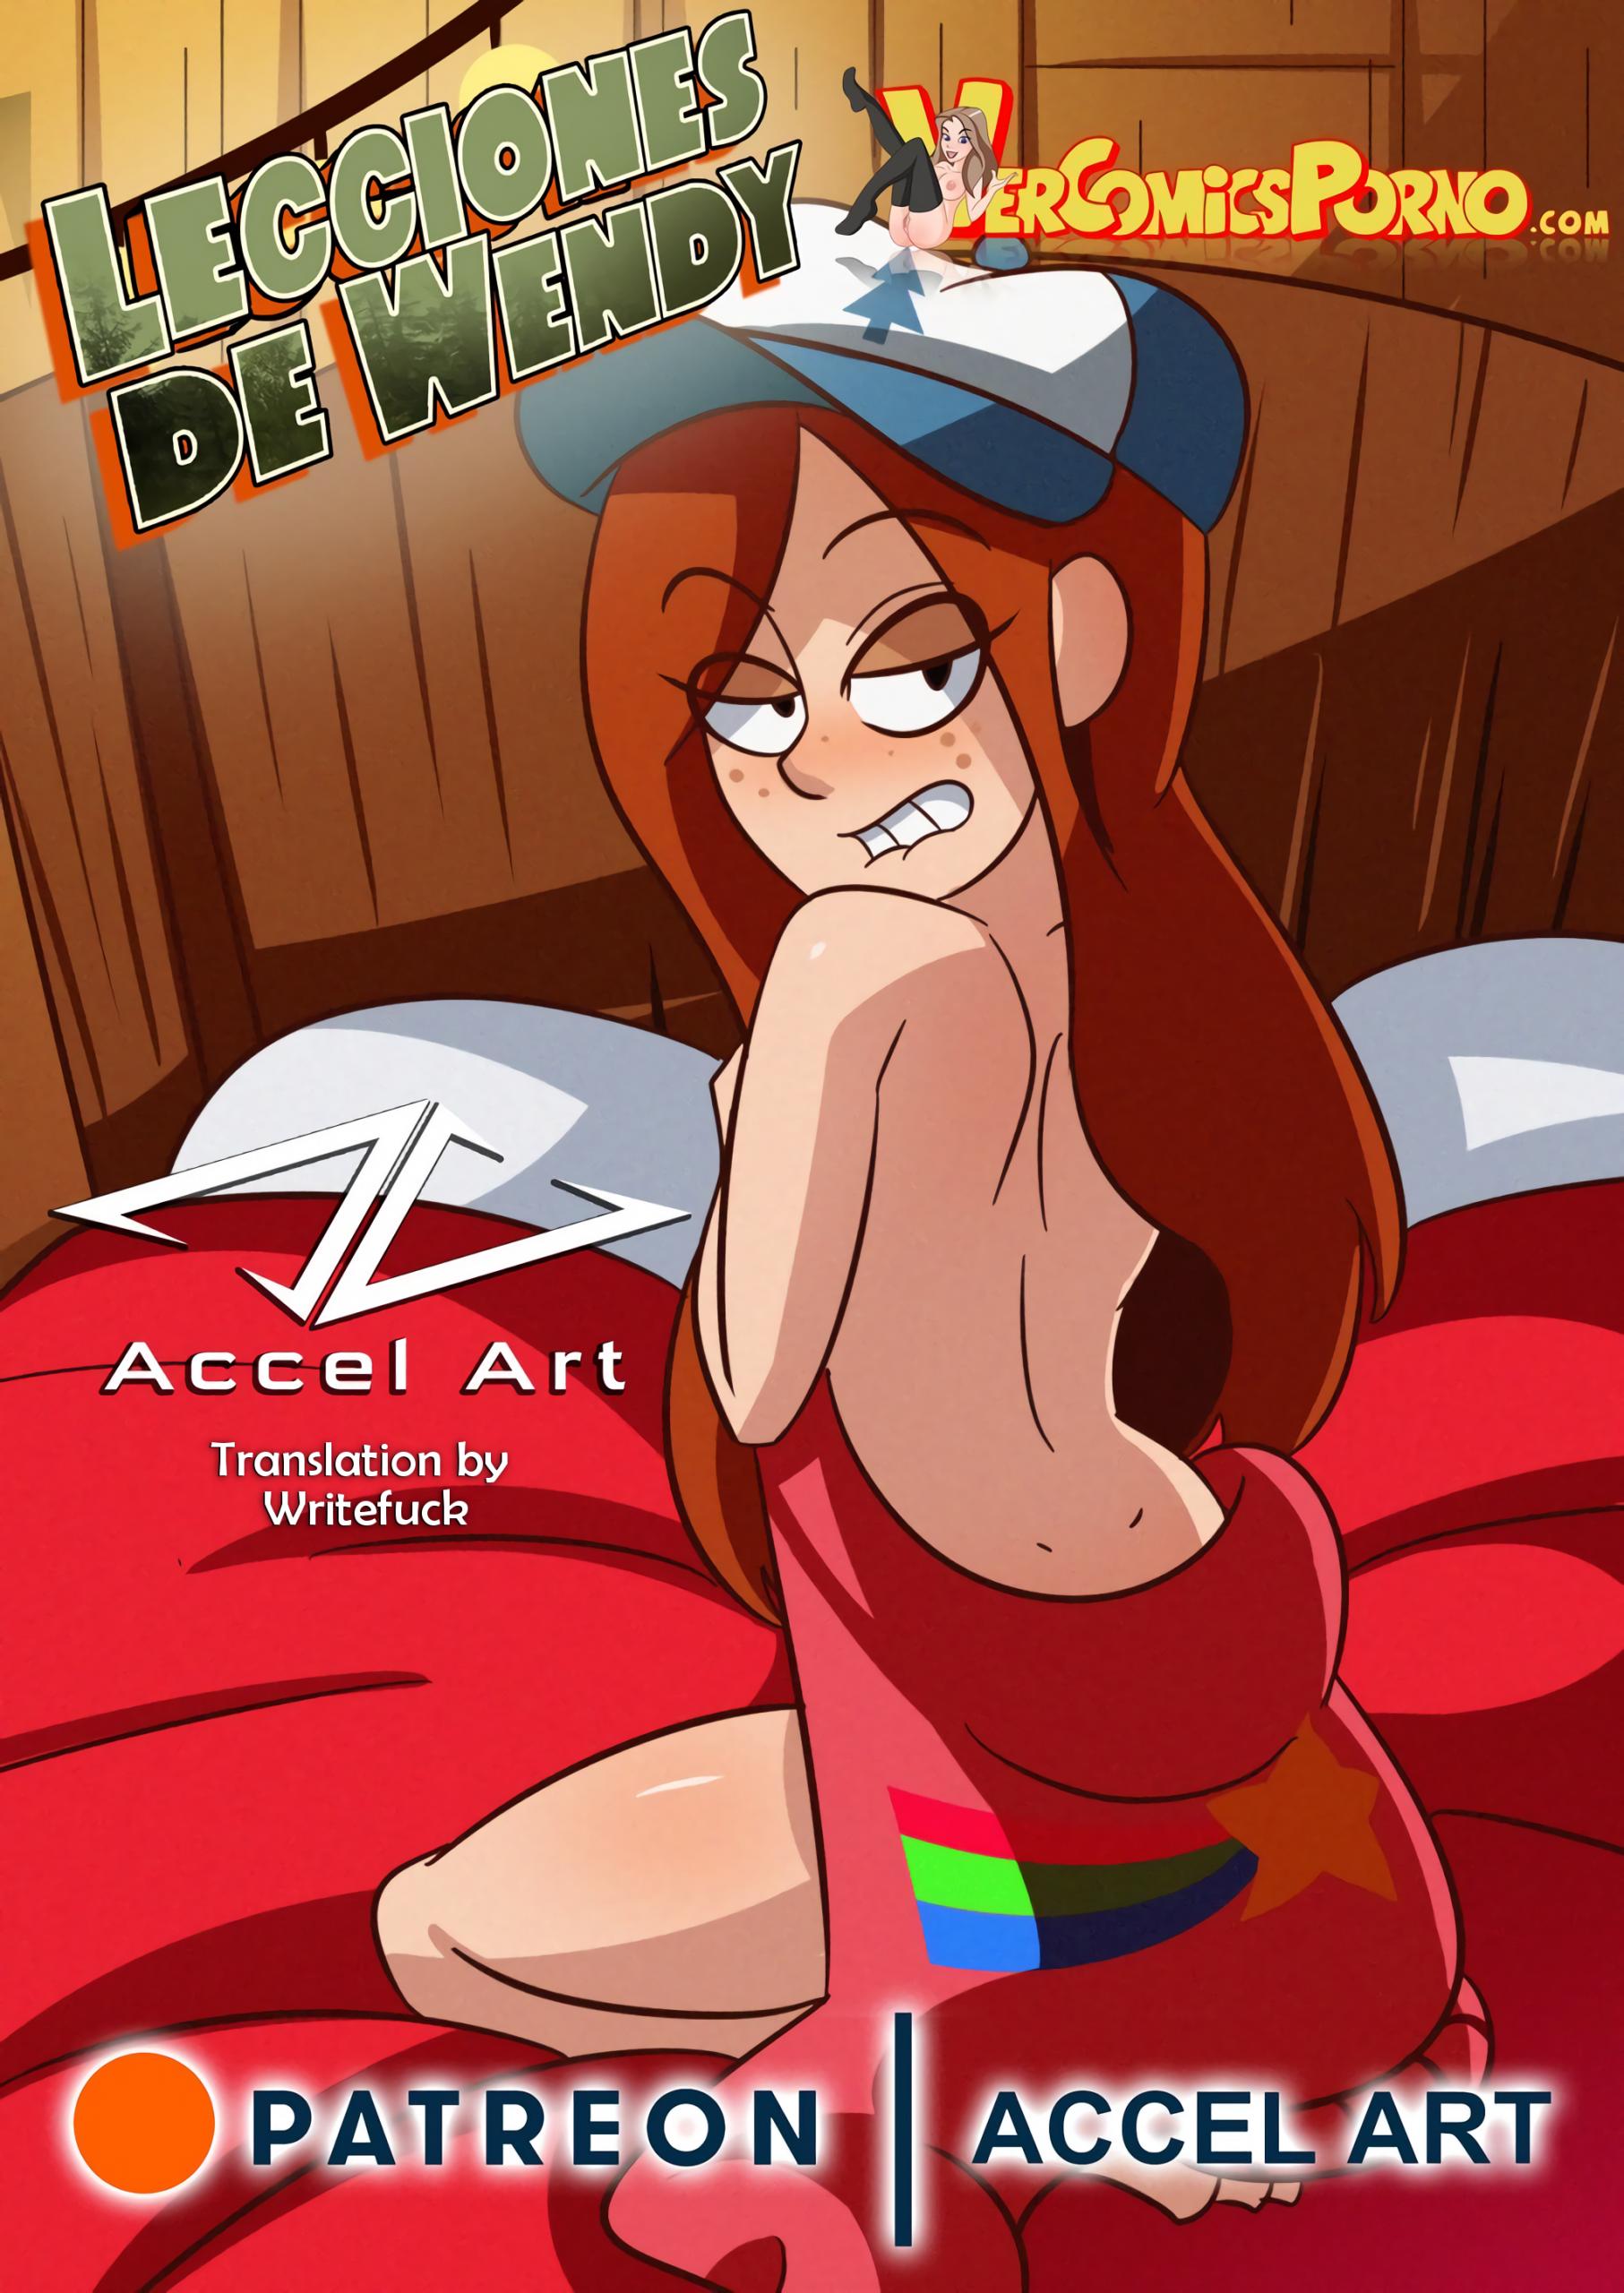 Wendy's Lessons porn comics Oral sex, Blowjob, Cum Swallow, cunnilingus, fingering, incest, Lesbians, Lolicon, Masturbation, Straight, Straight Shota